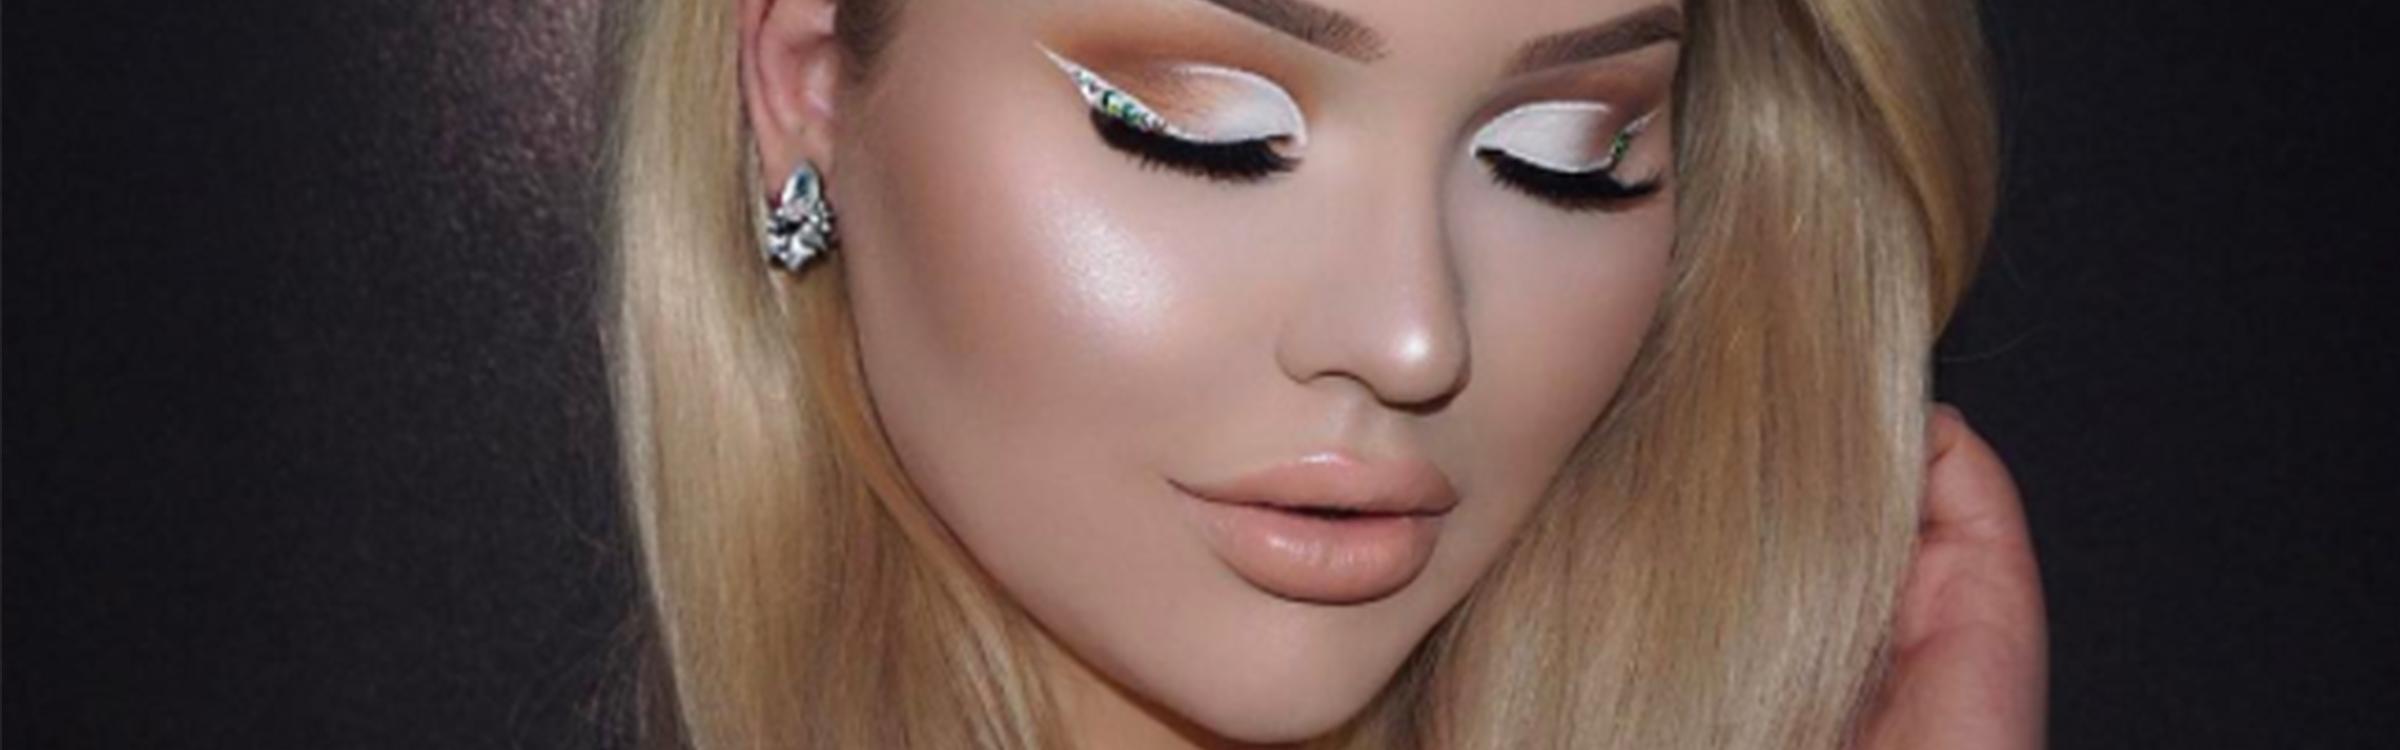 Makeupkatyh